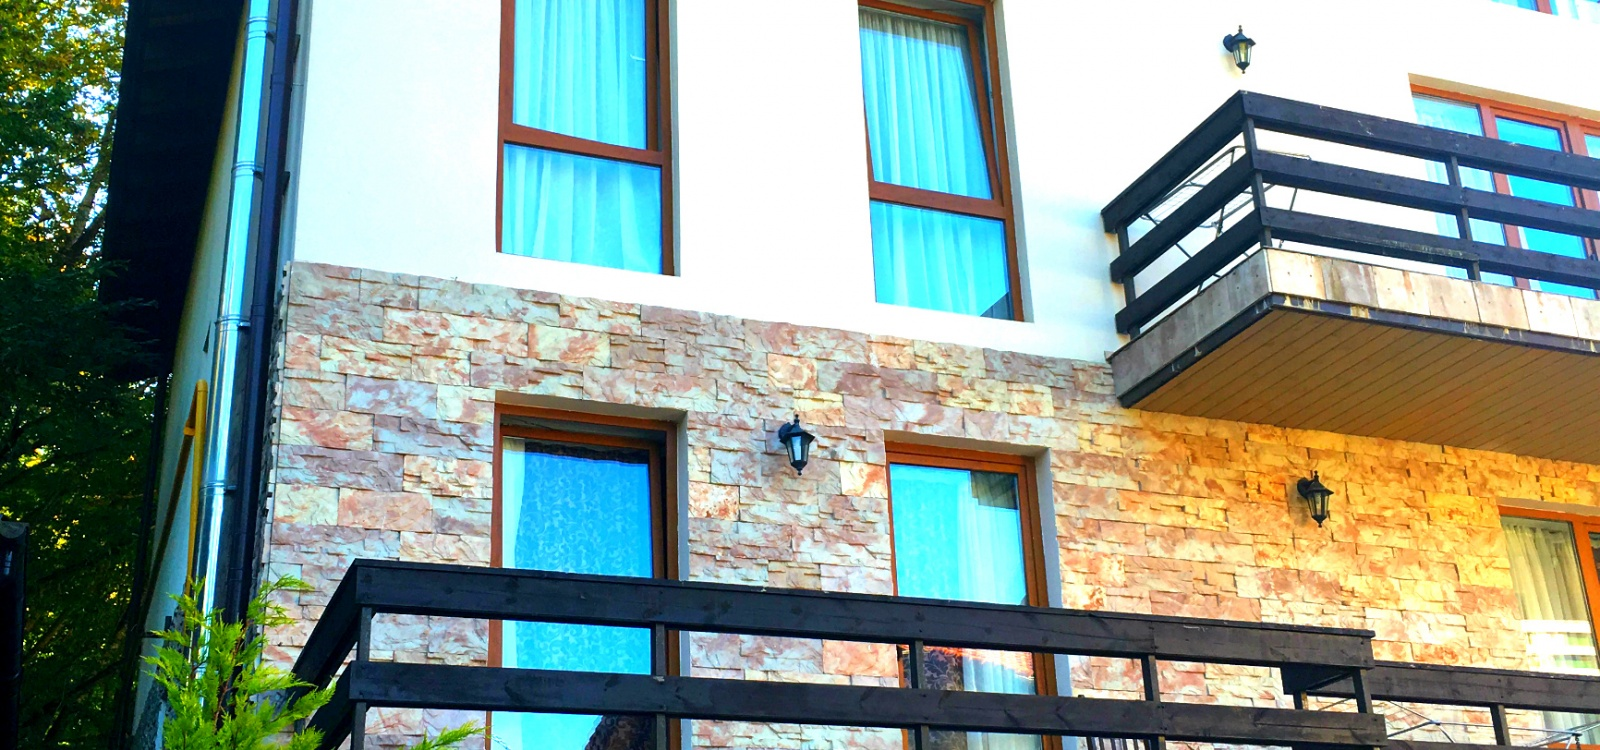 1 Bedrooms, Квартира, Продажа, Защитников Кавказа, Third Floor, 1 Bathrooms, Listing ID 1053, Красная Поляна, Краснодарский край, Россия,